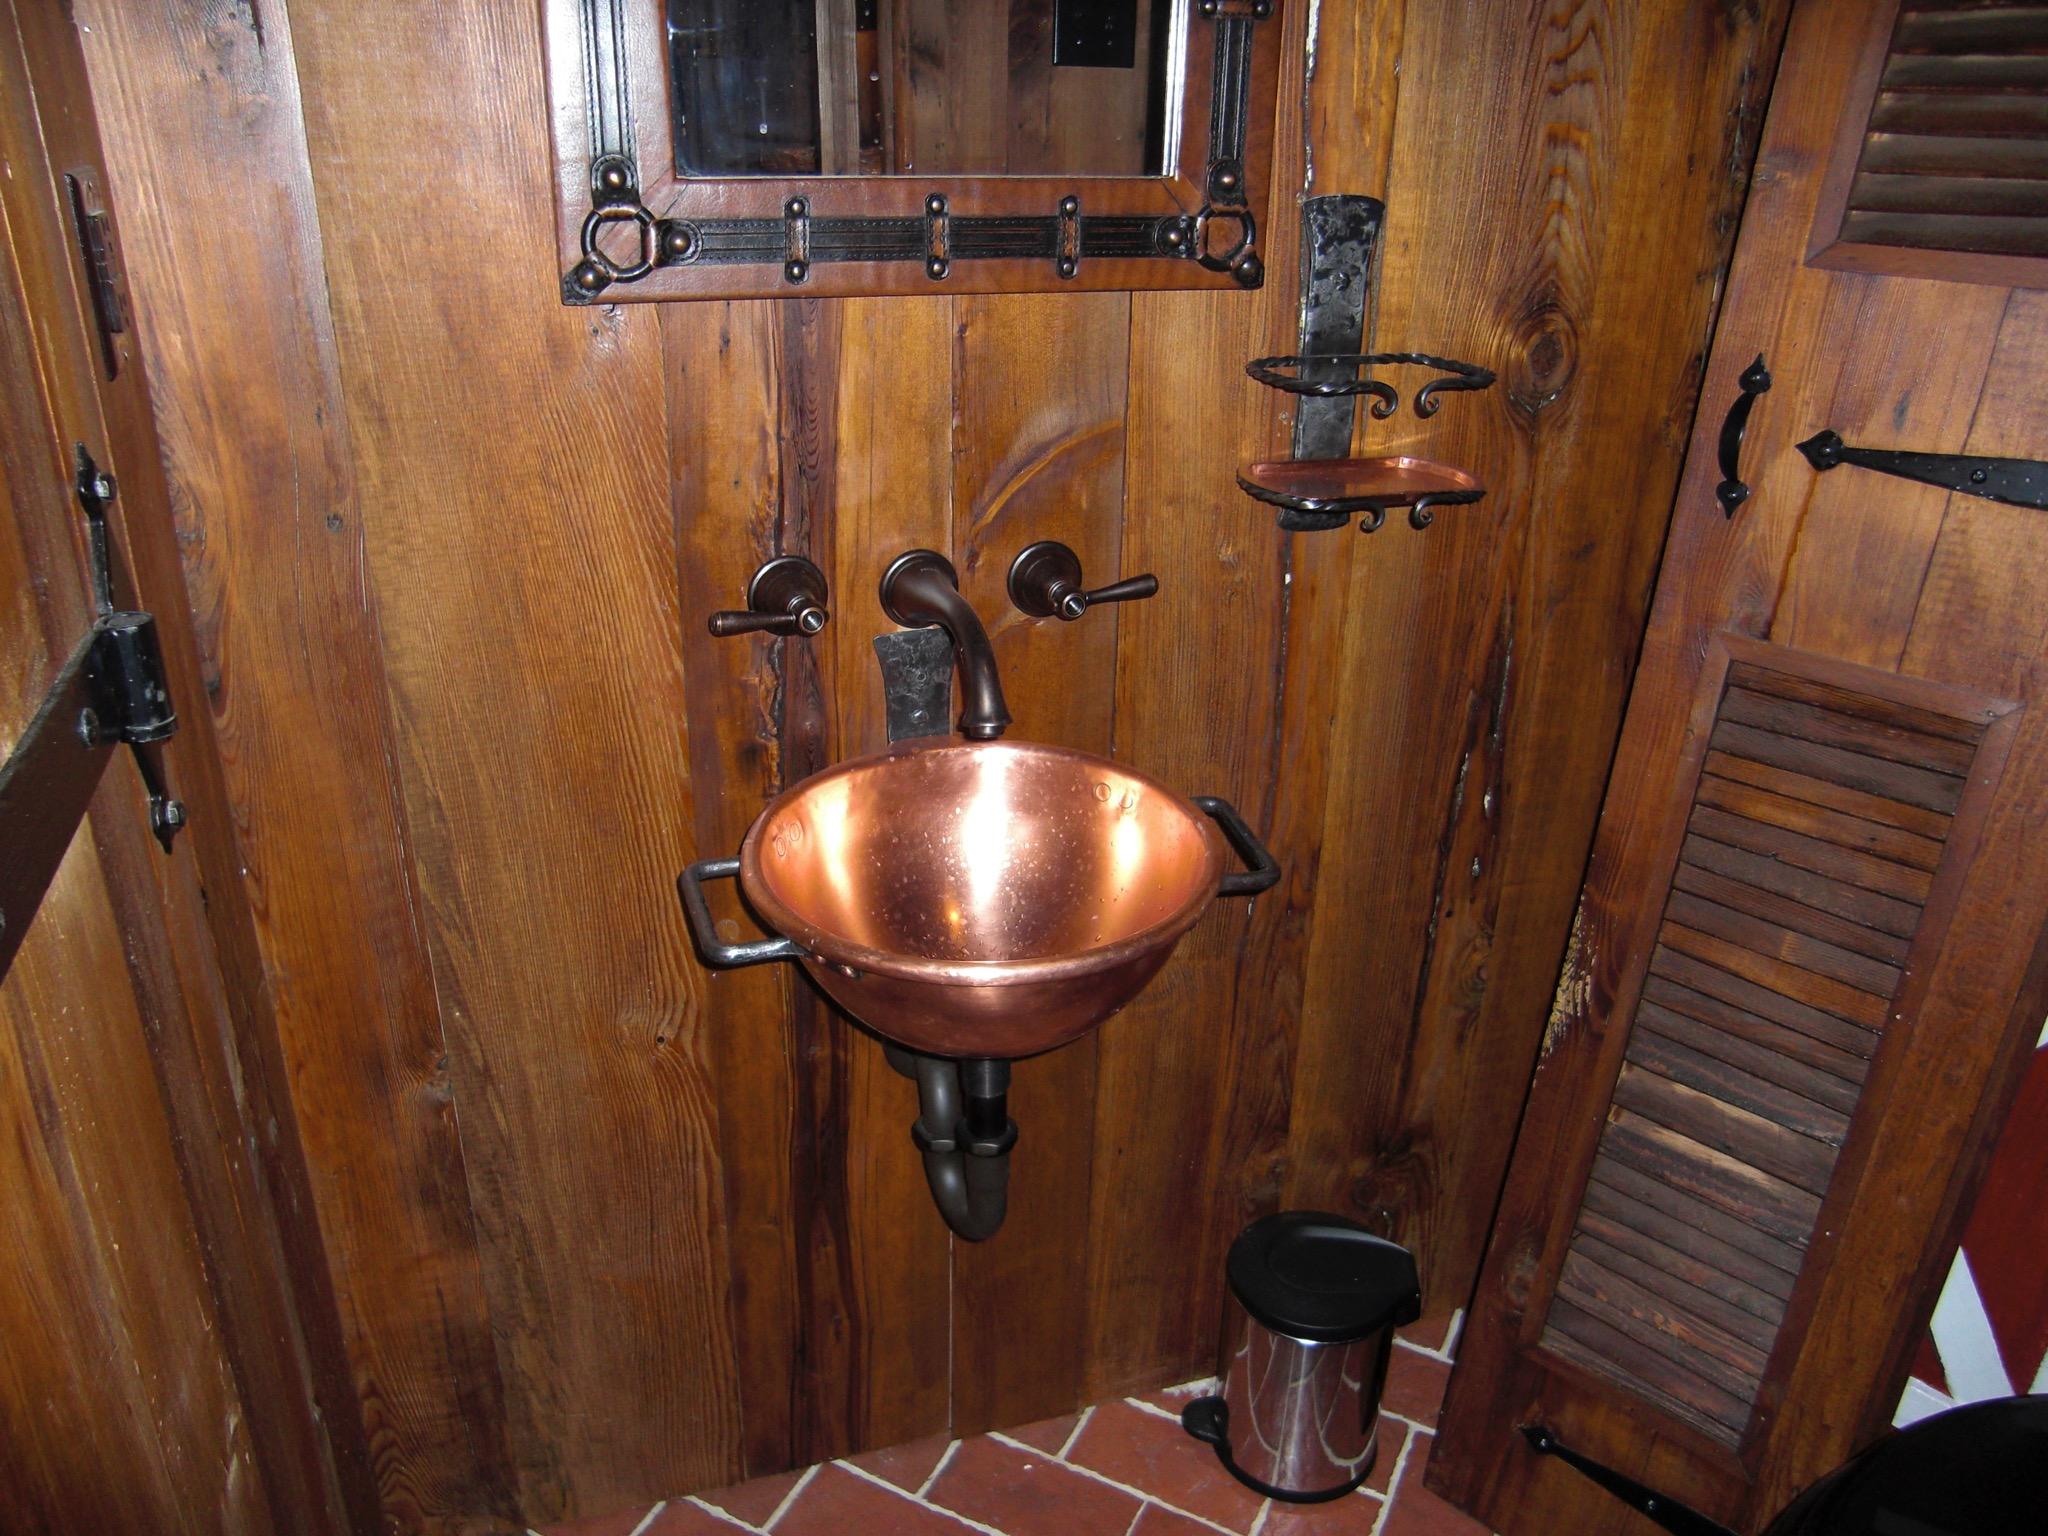 15. Tack Room Sink